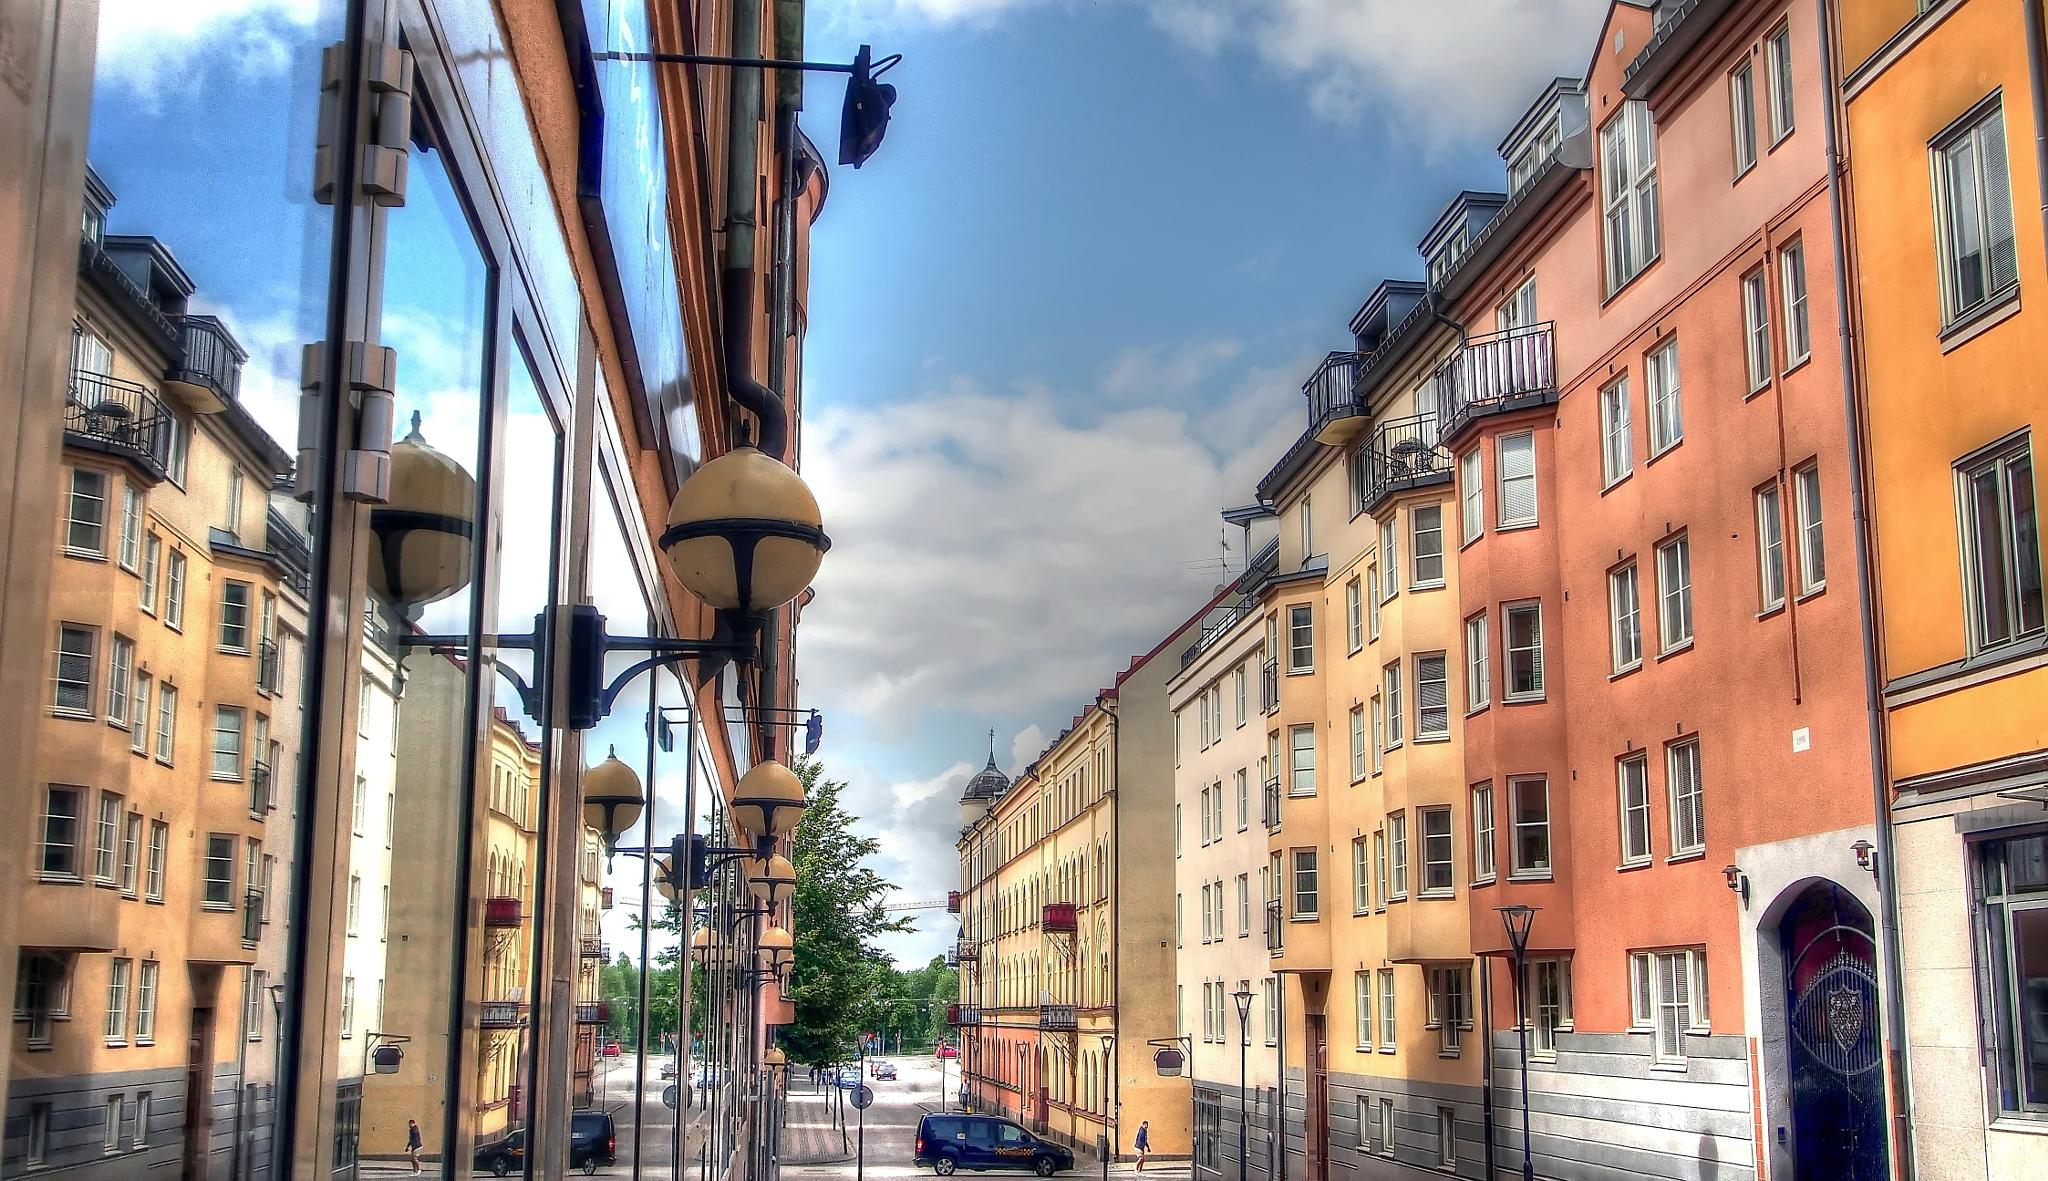 Streetview... by rockorbach